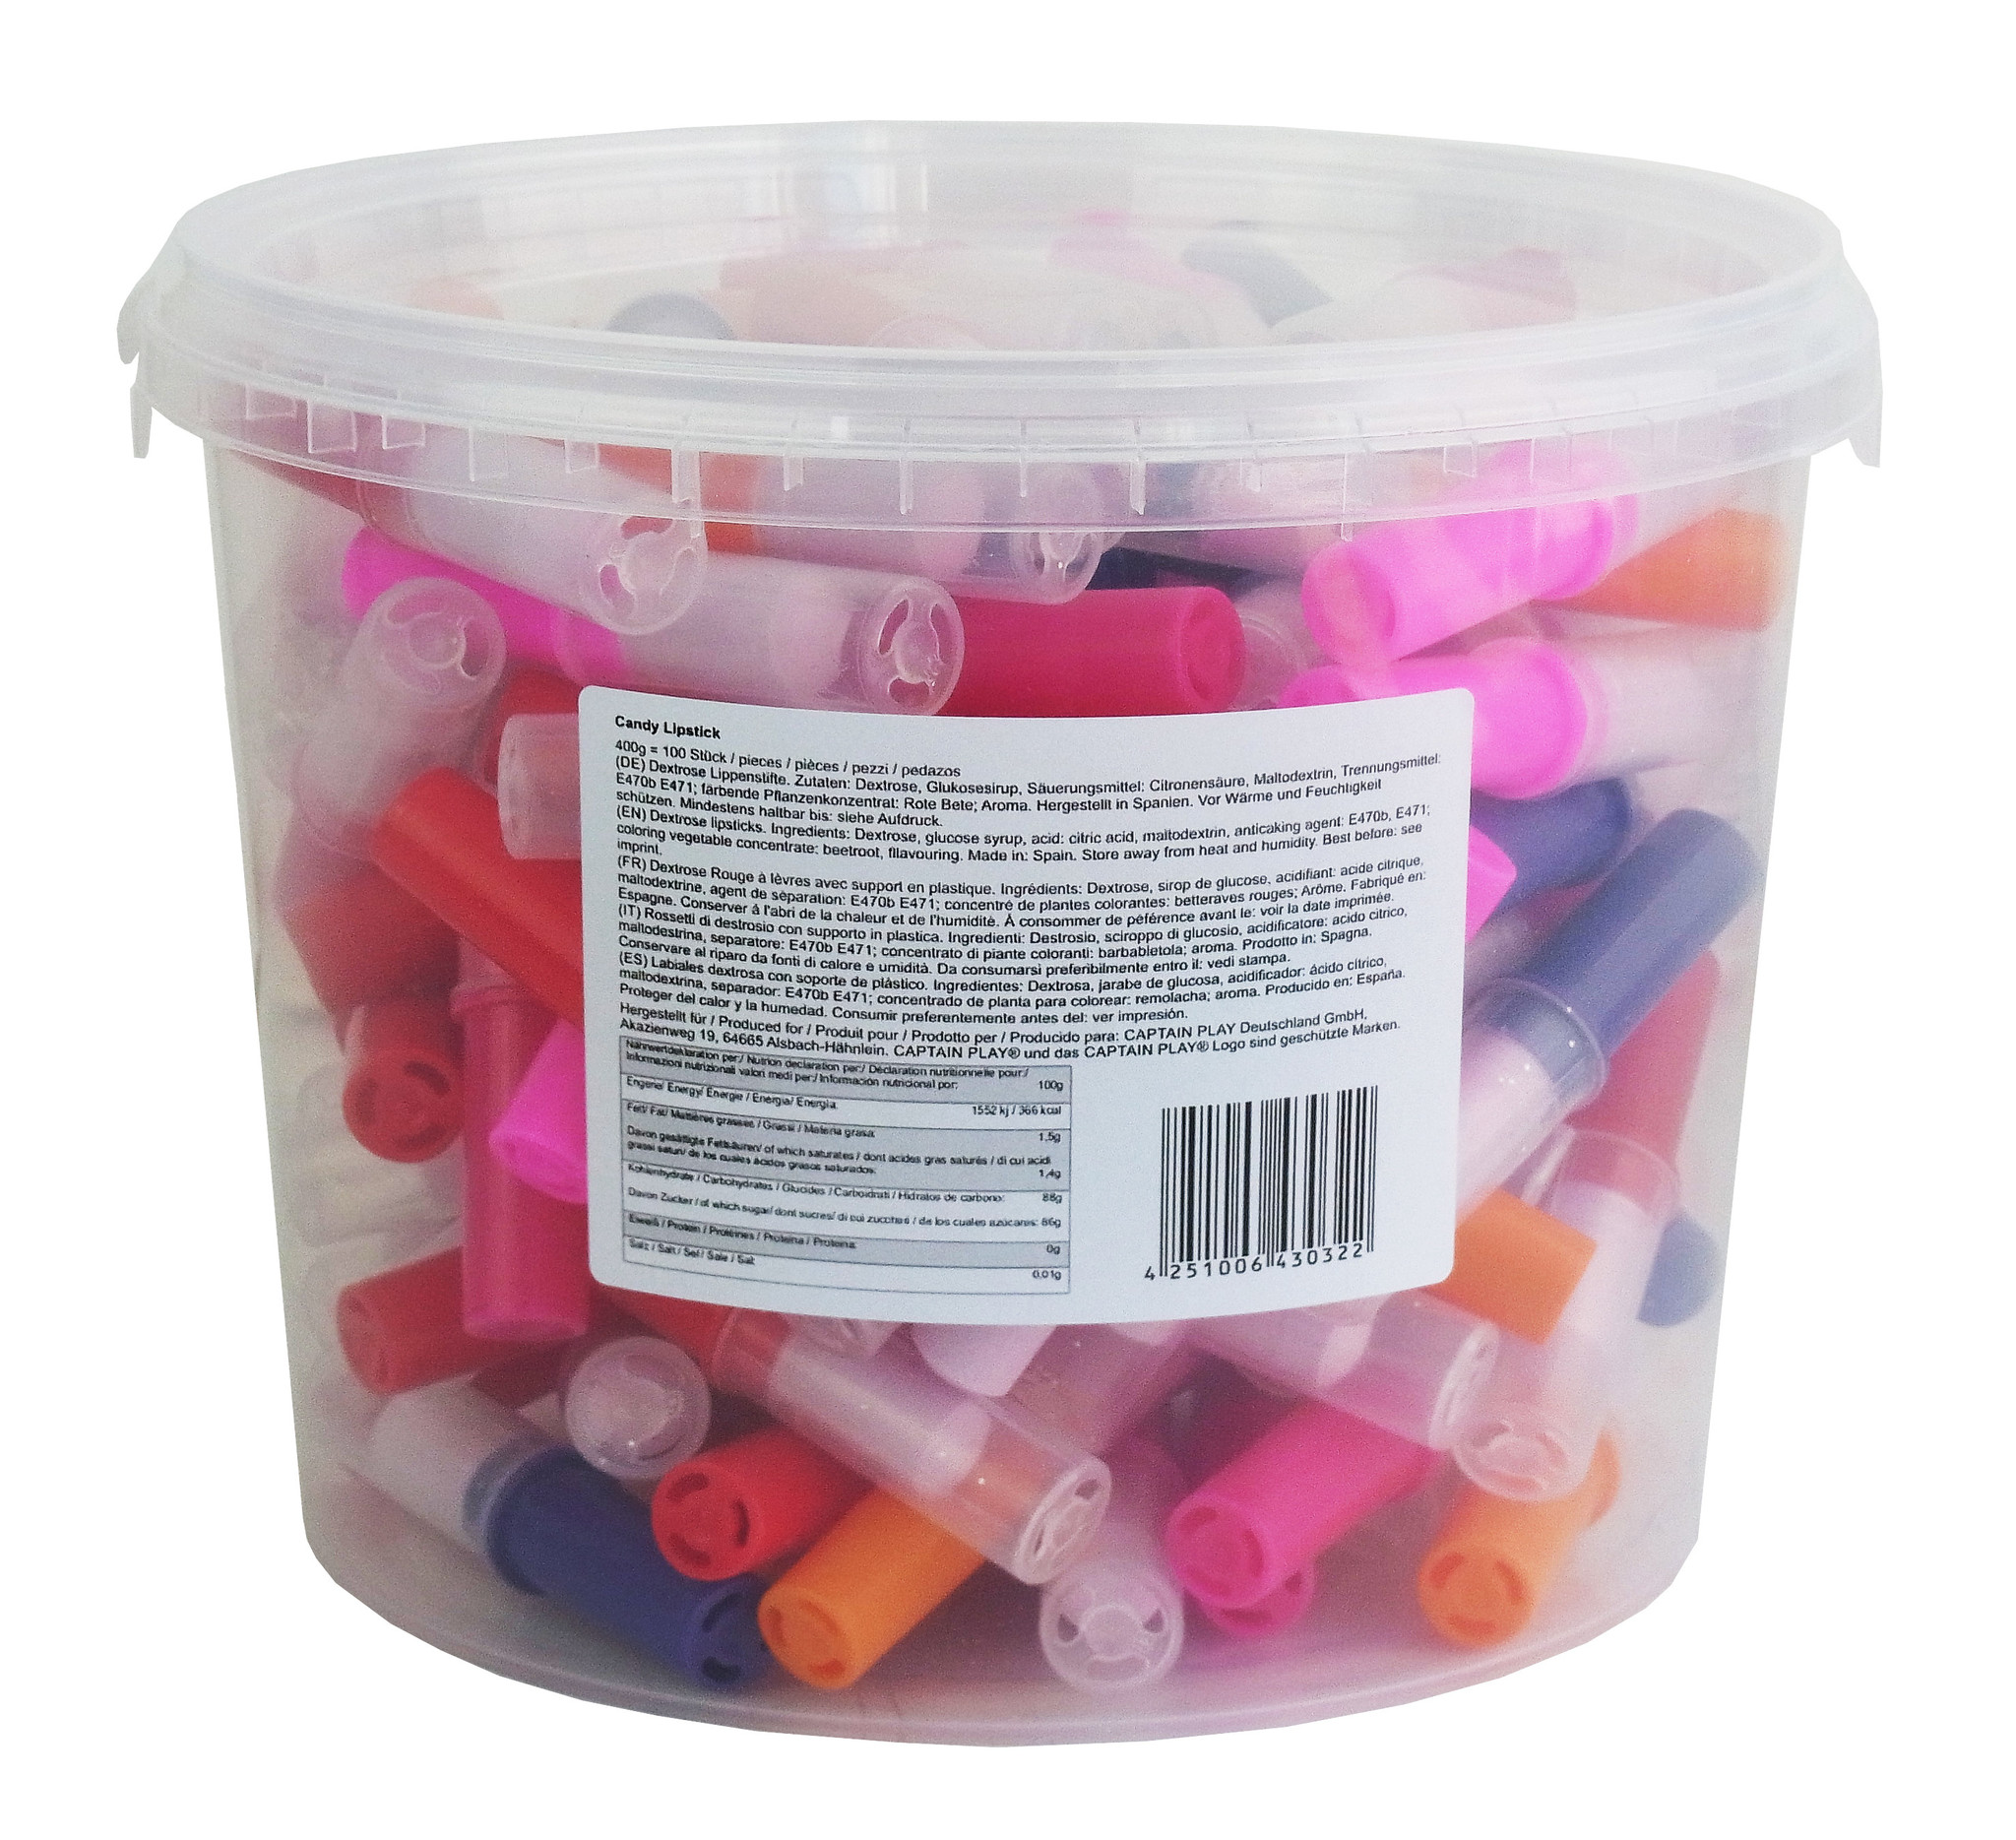 CAPTAIN PLAY Candy Lipstick, 100 Süßwaren Lippenstift einzeln verpackt im Party Bucket